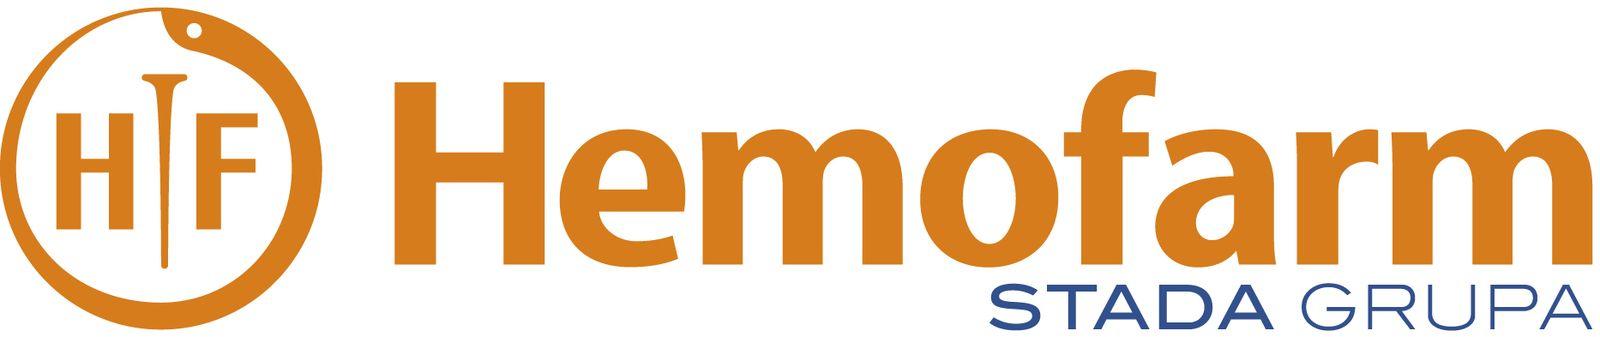 Hemofarm AD-logo